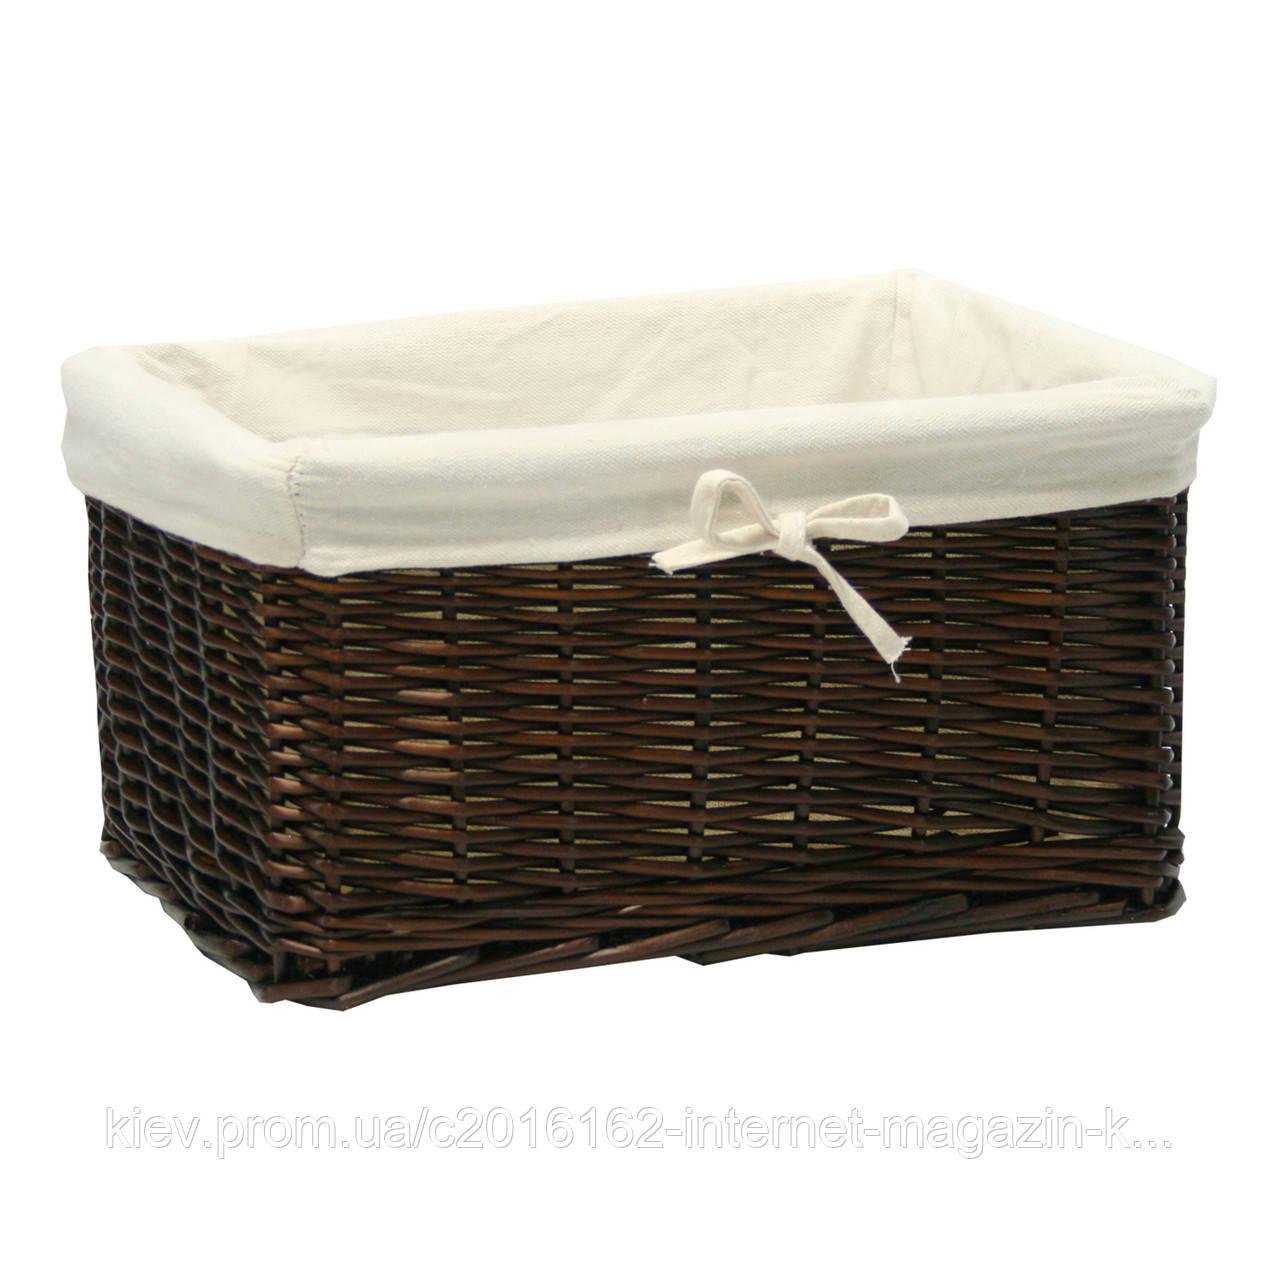 Корзинка для дома из лозы и хлопка Home4You MAX 37x29x19cm  weave  dark brown  fabric